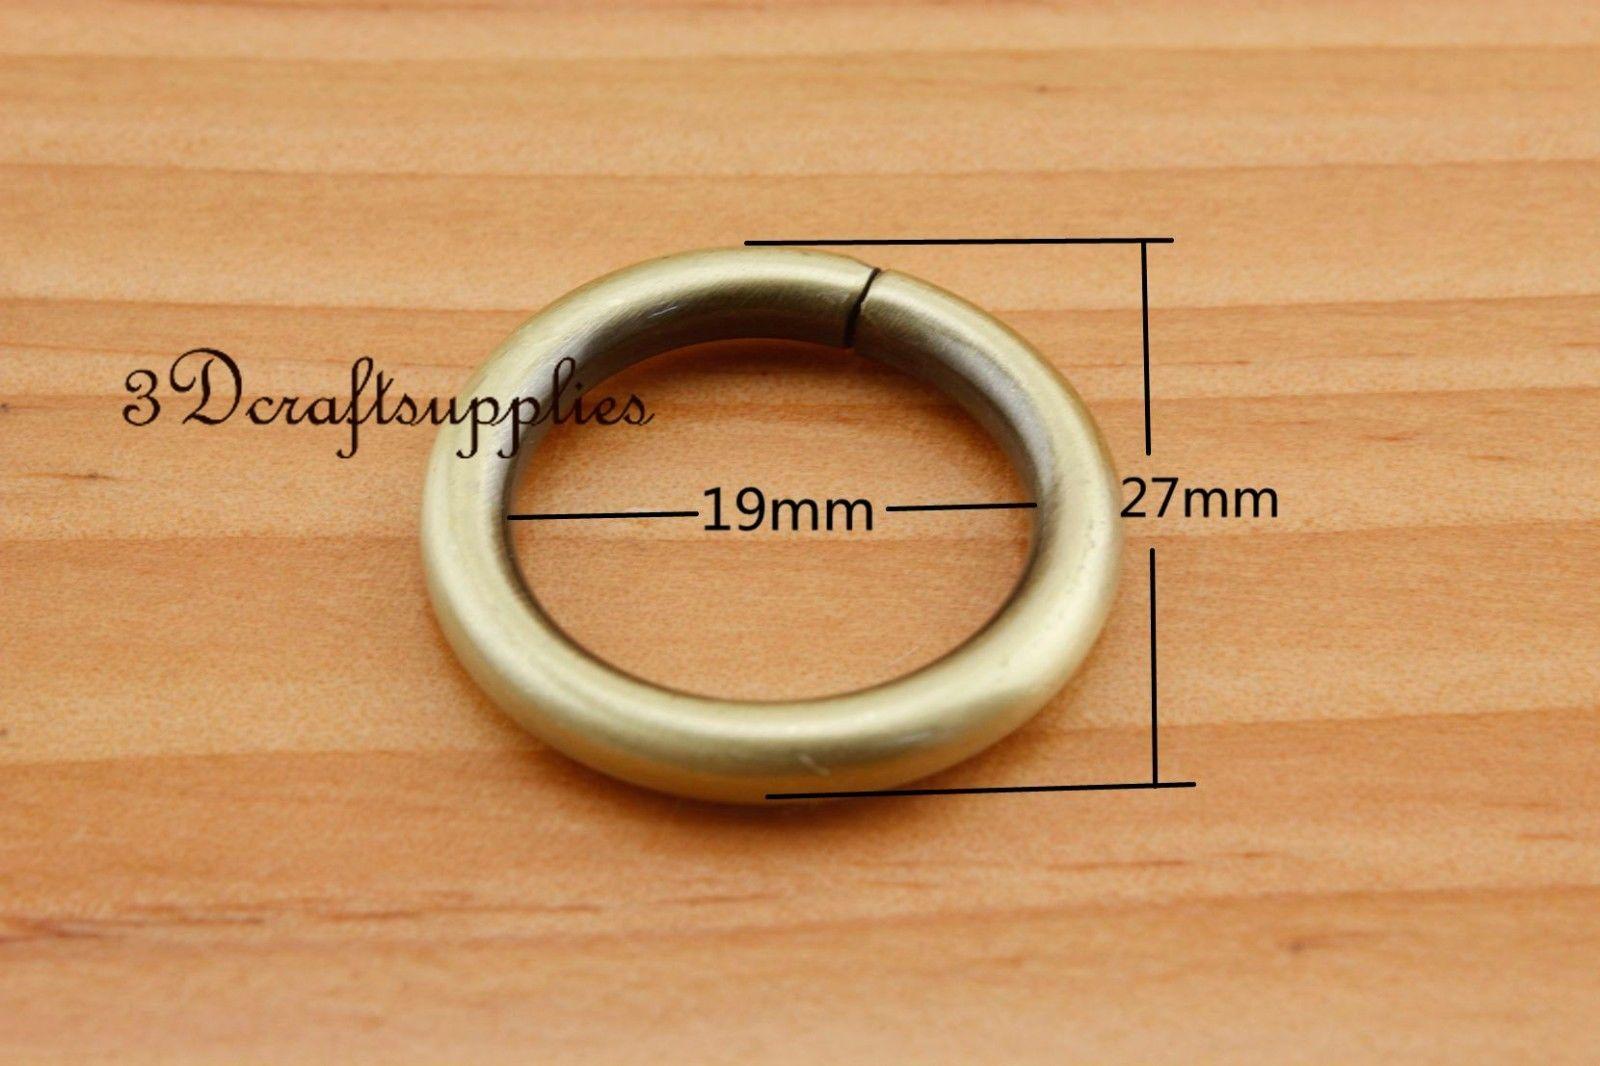 Conector do anel de metal rings-ring bolsa anti bronze 19mm 3/4 polegada 12 pcs U164